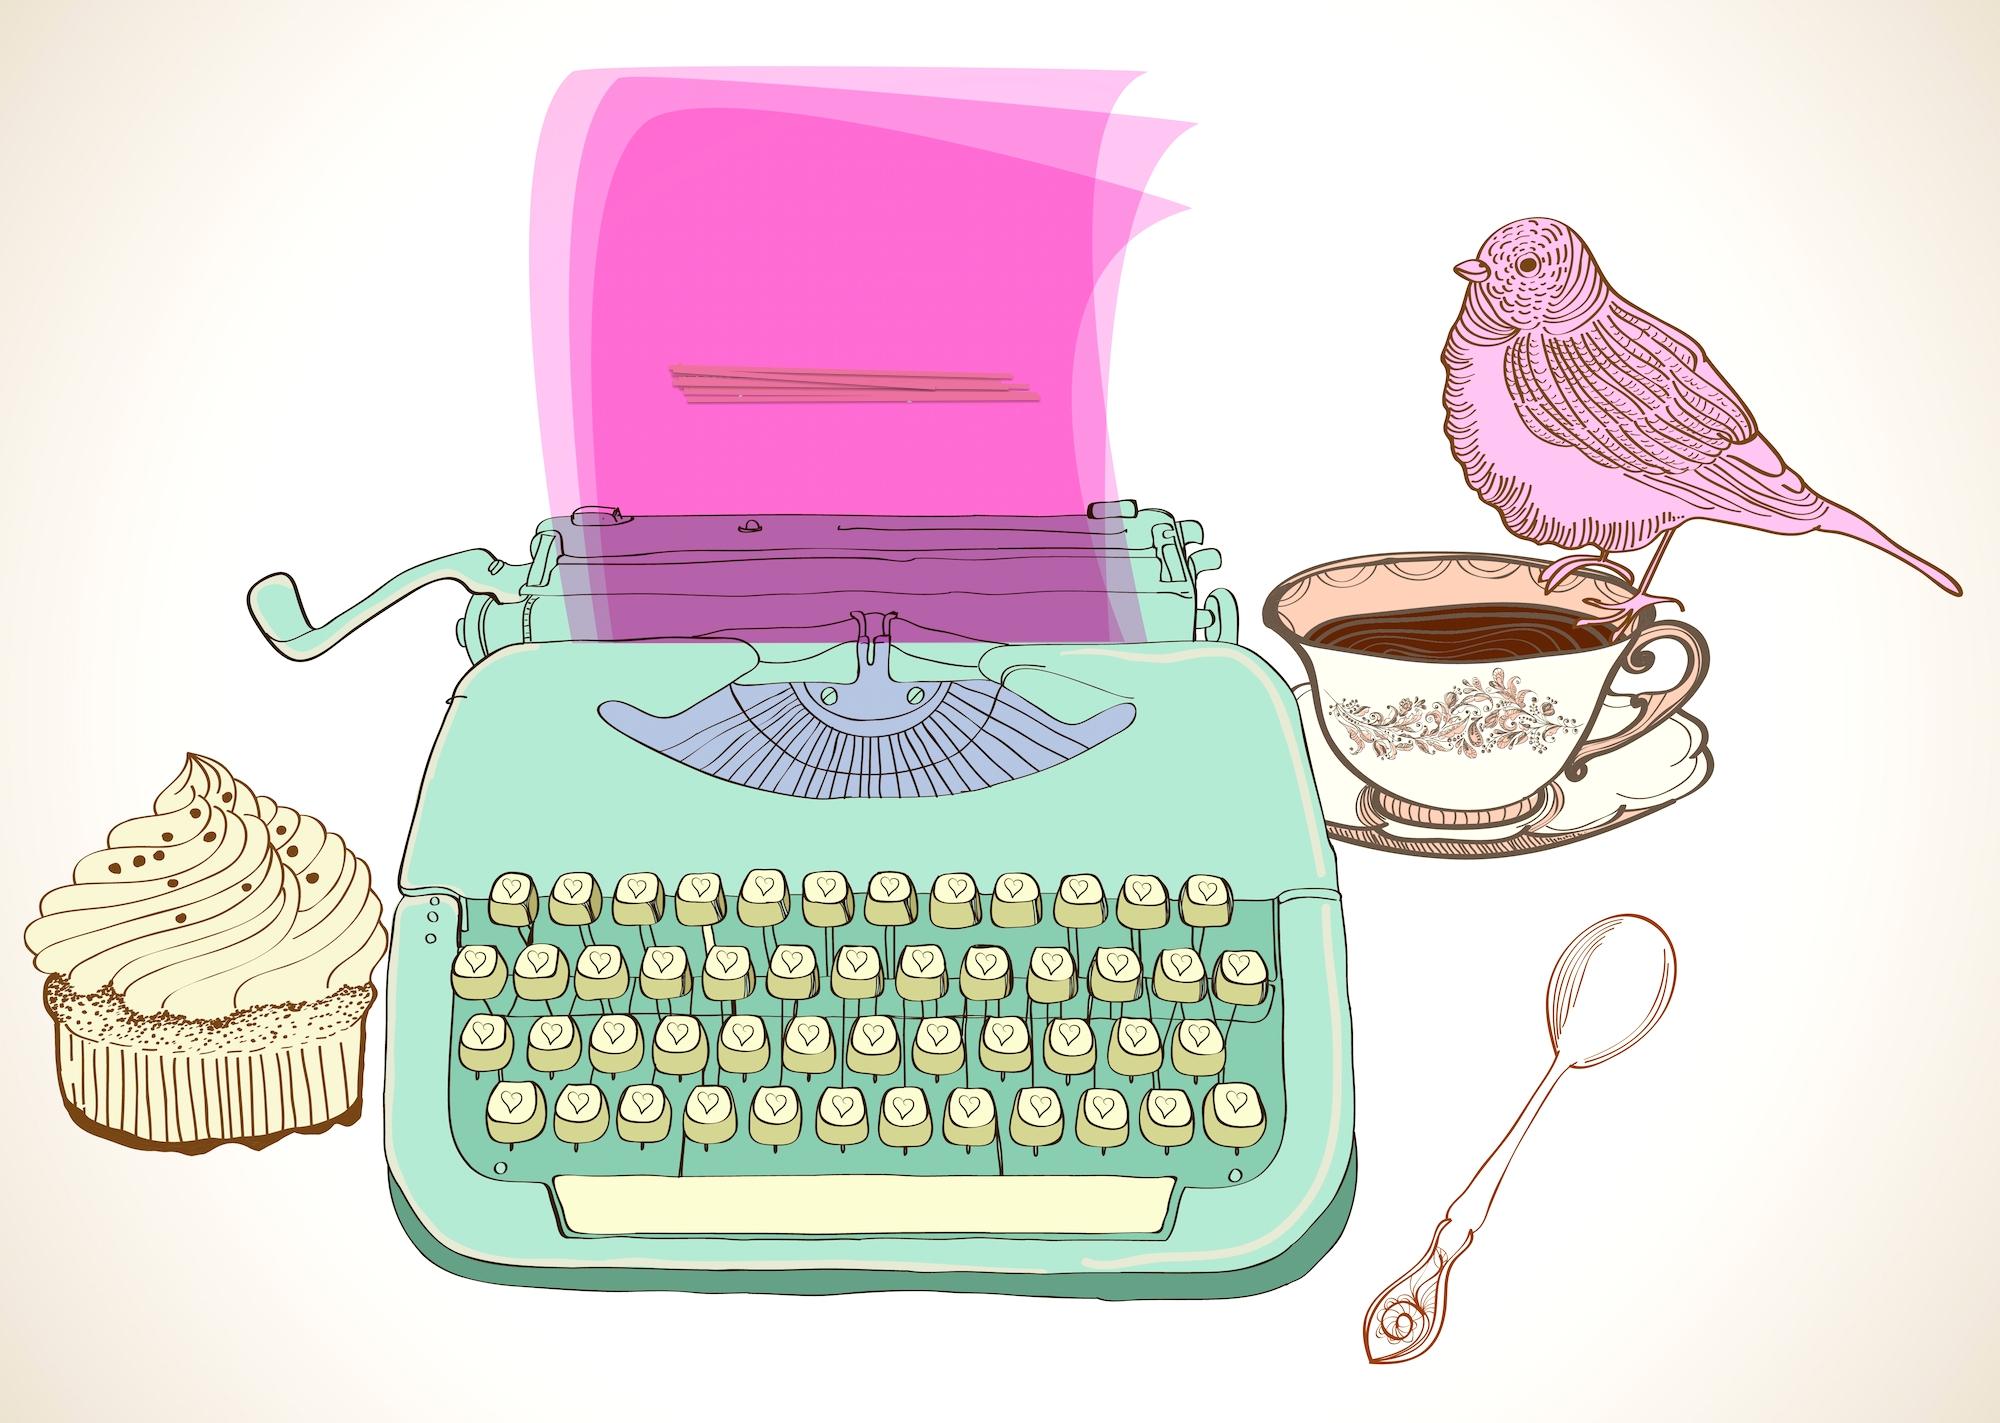 retro typewriter background